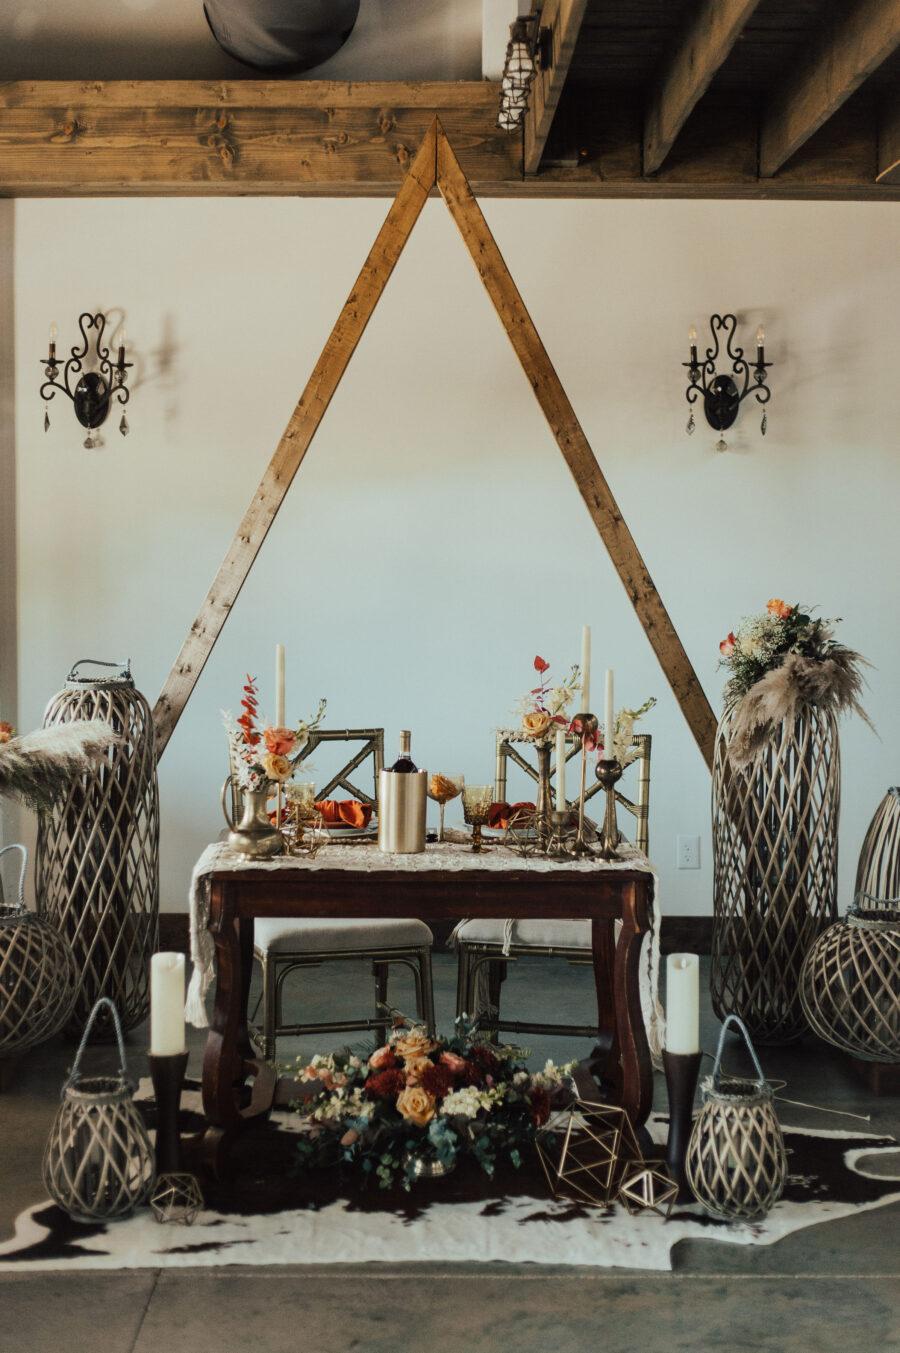 Boho wedding sweetheart table: Bright Bohemian Photo Shoot from Ina J Designs